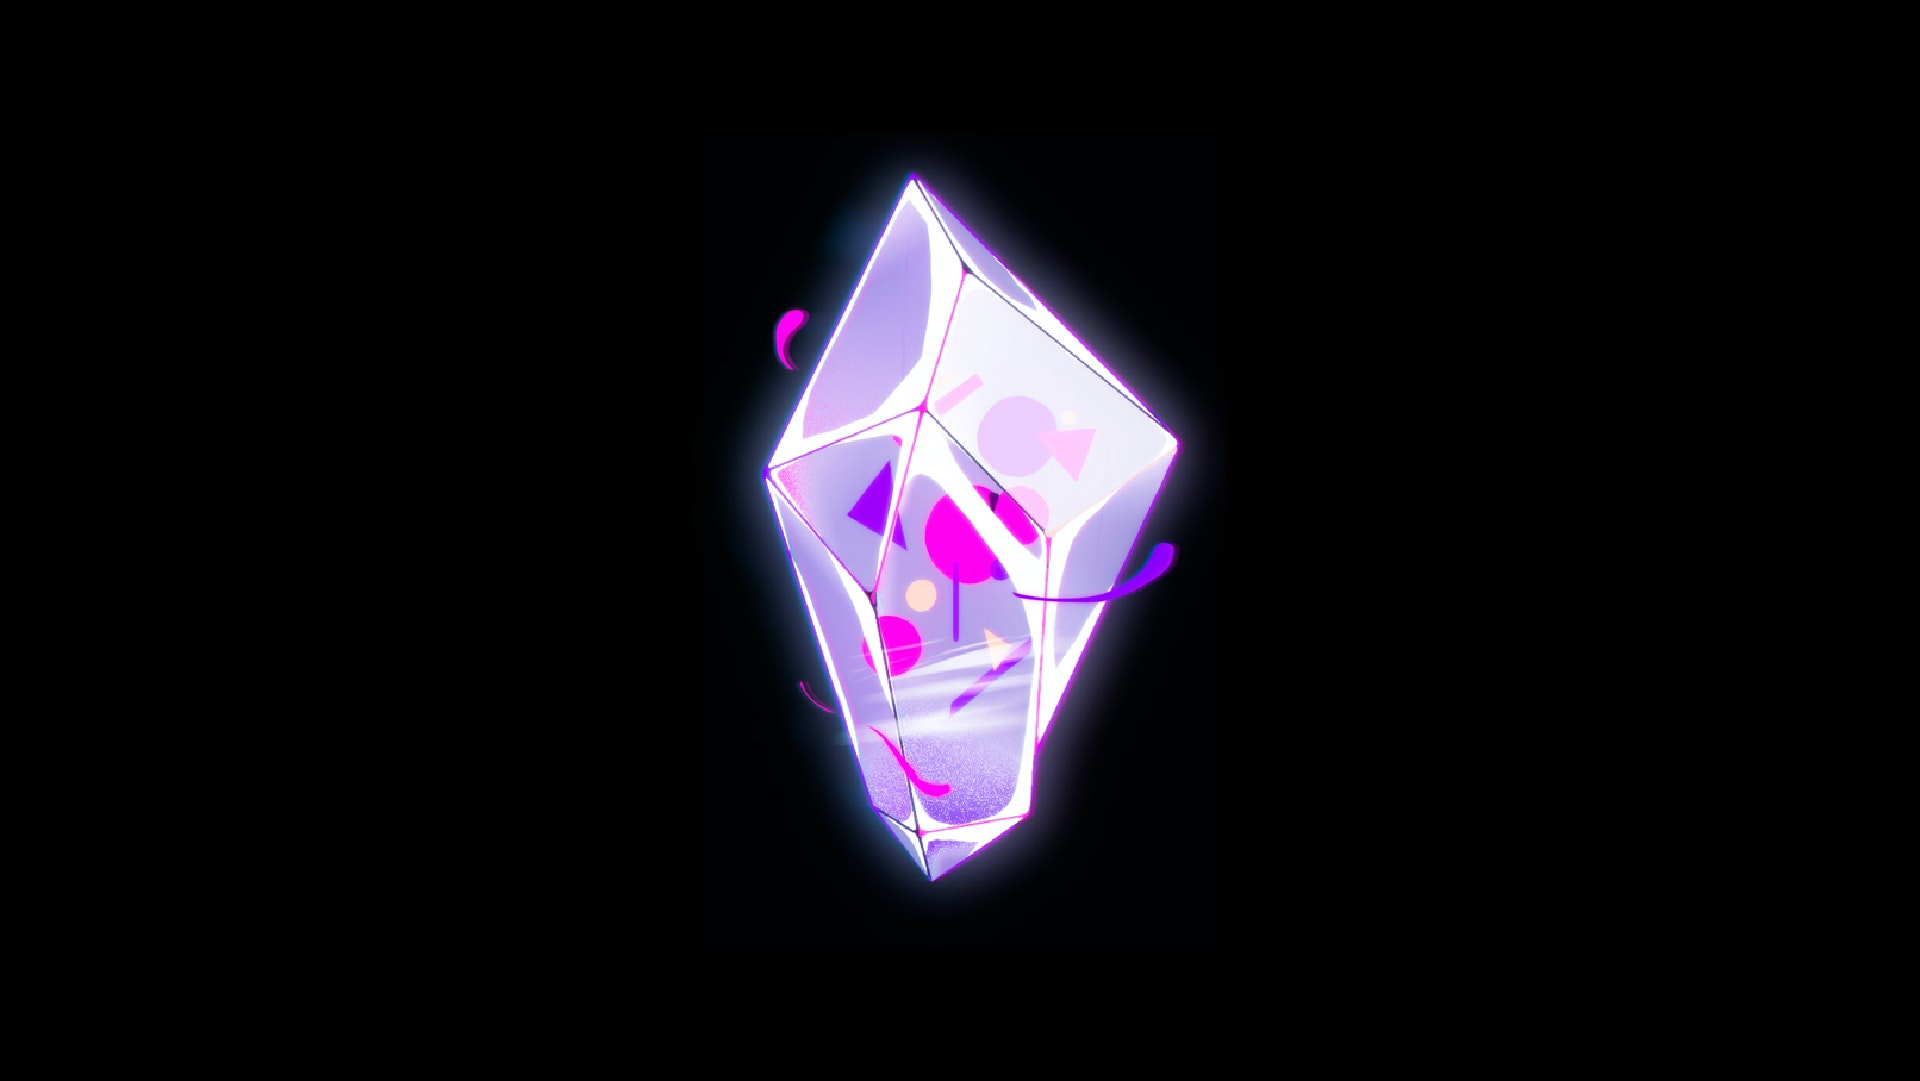 Concept art of a magic diamond